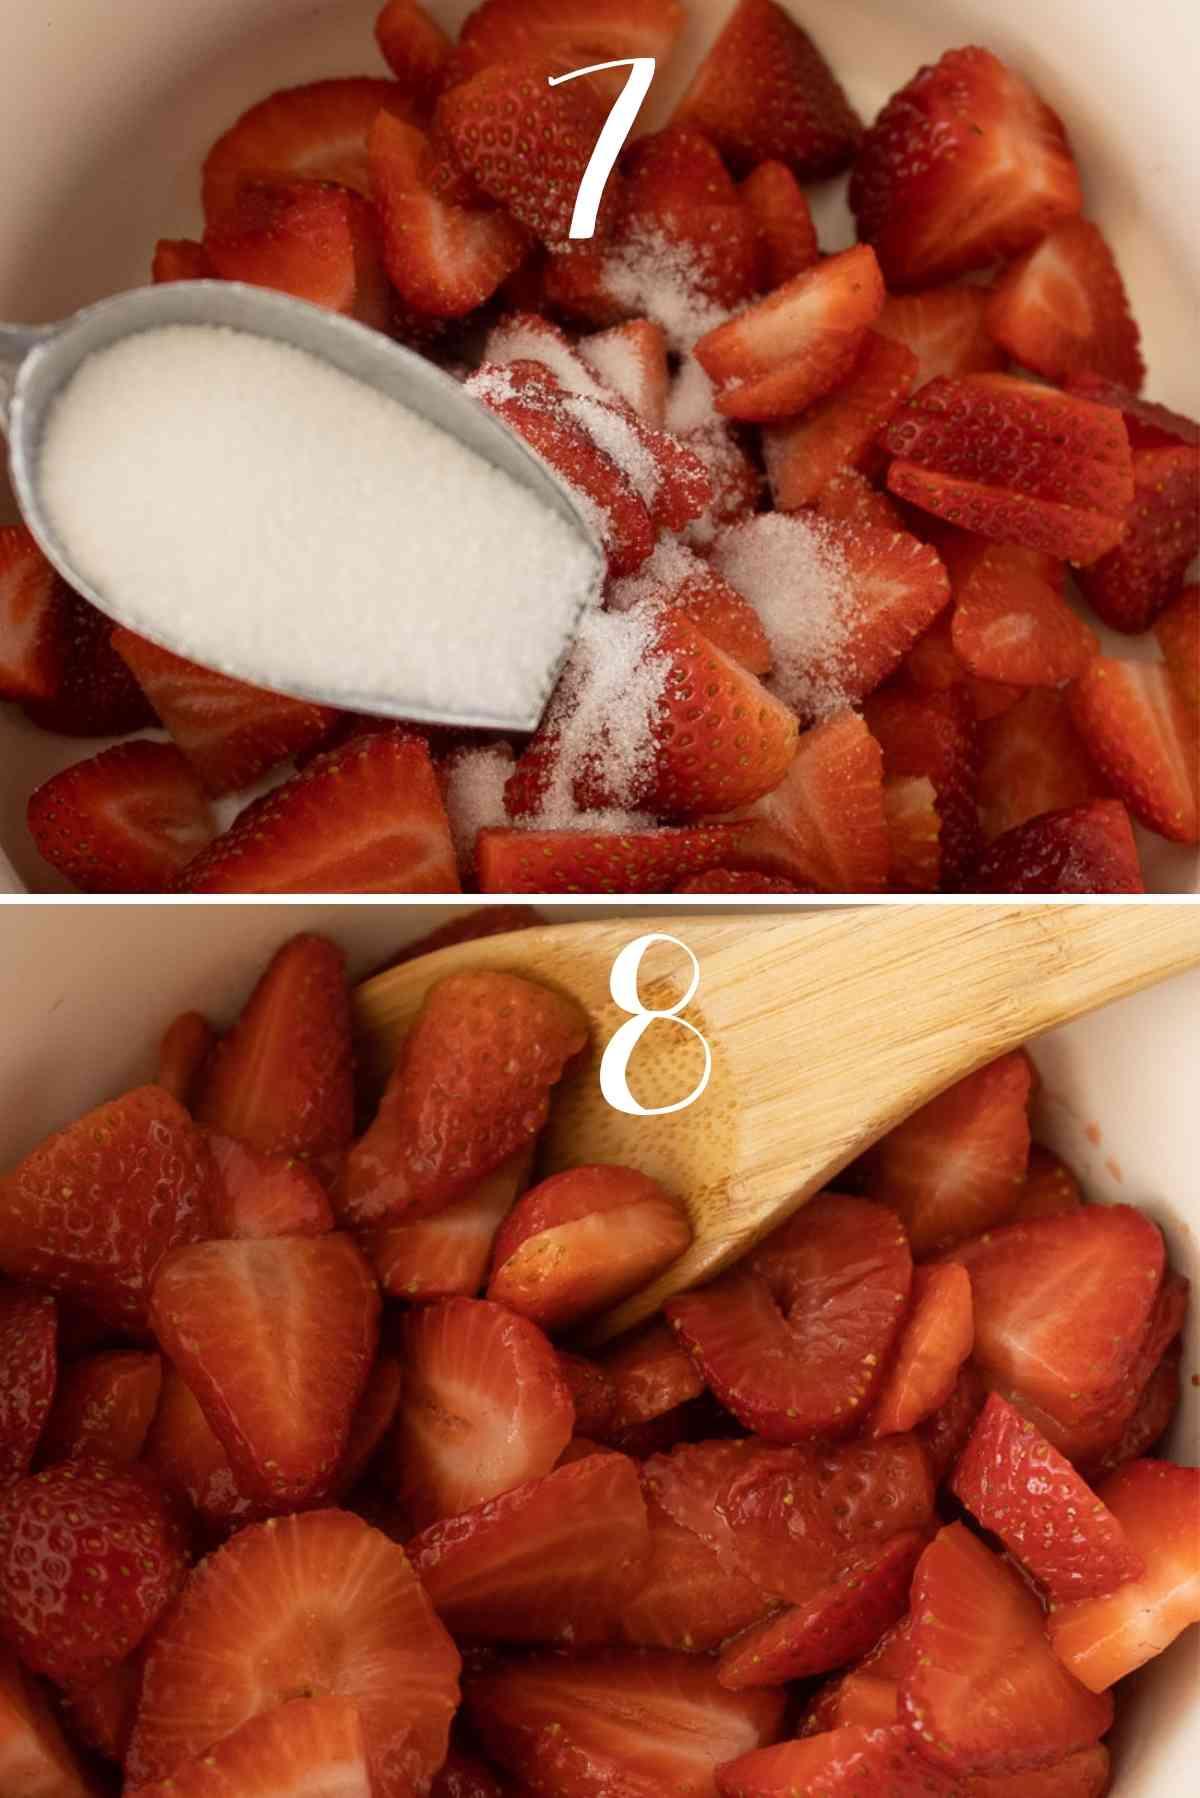 Preparing of the strawberries.